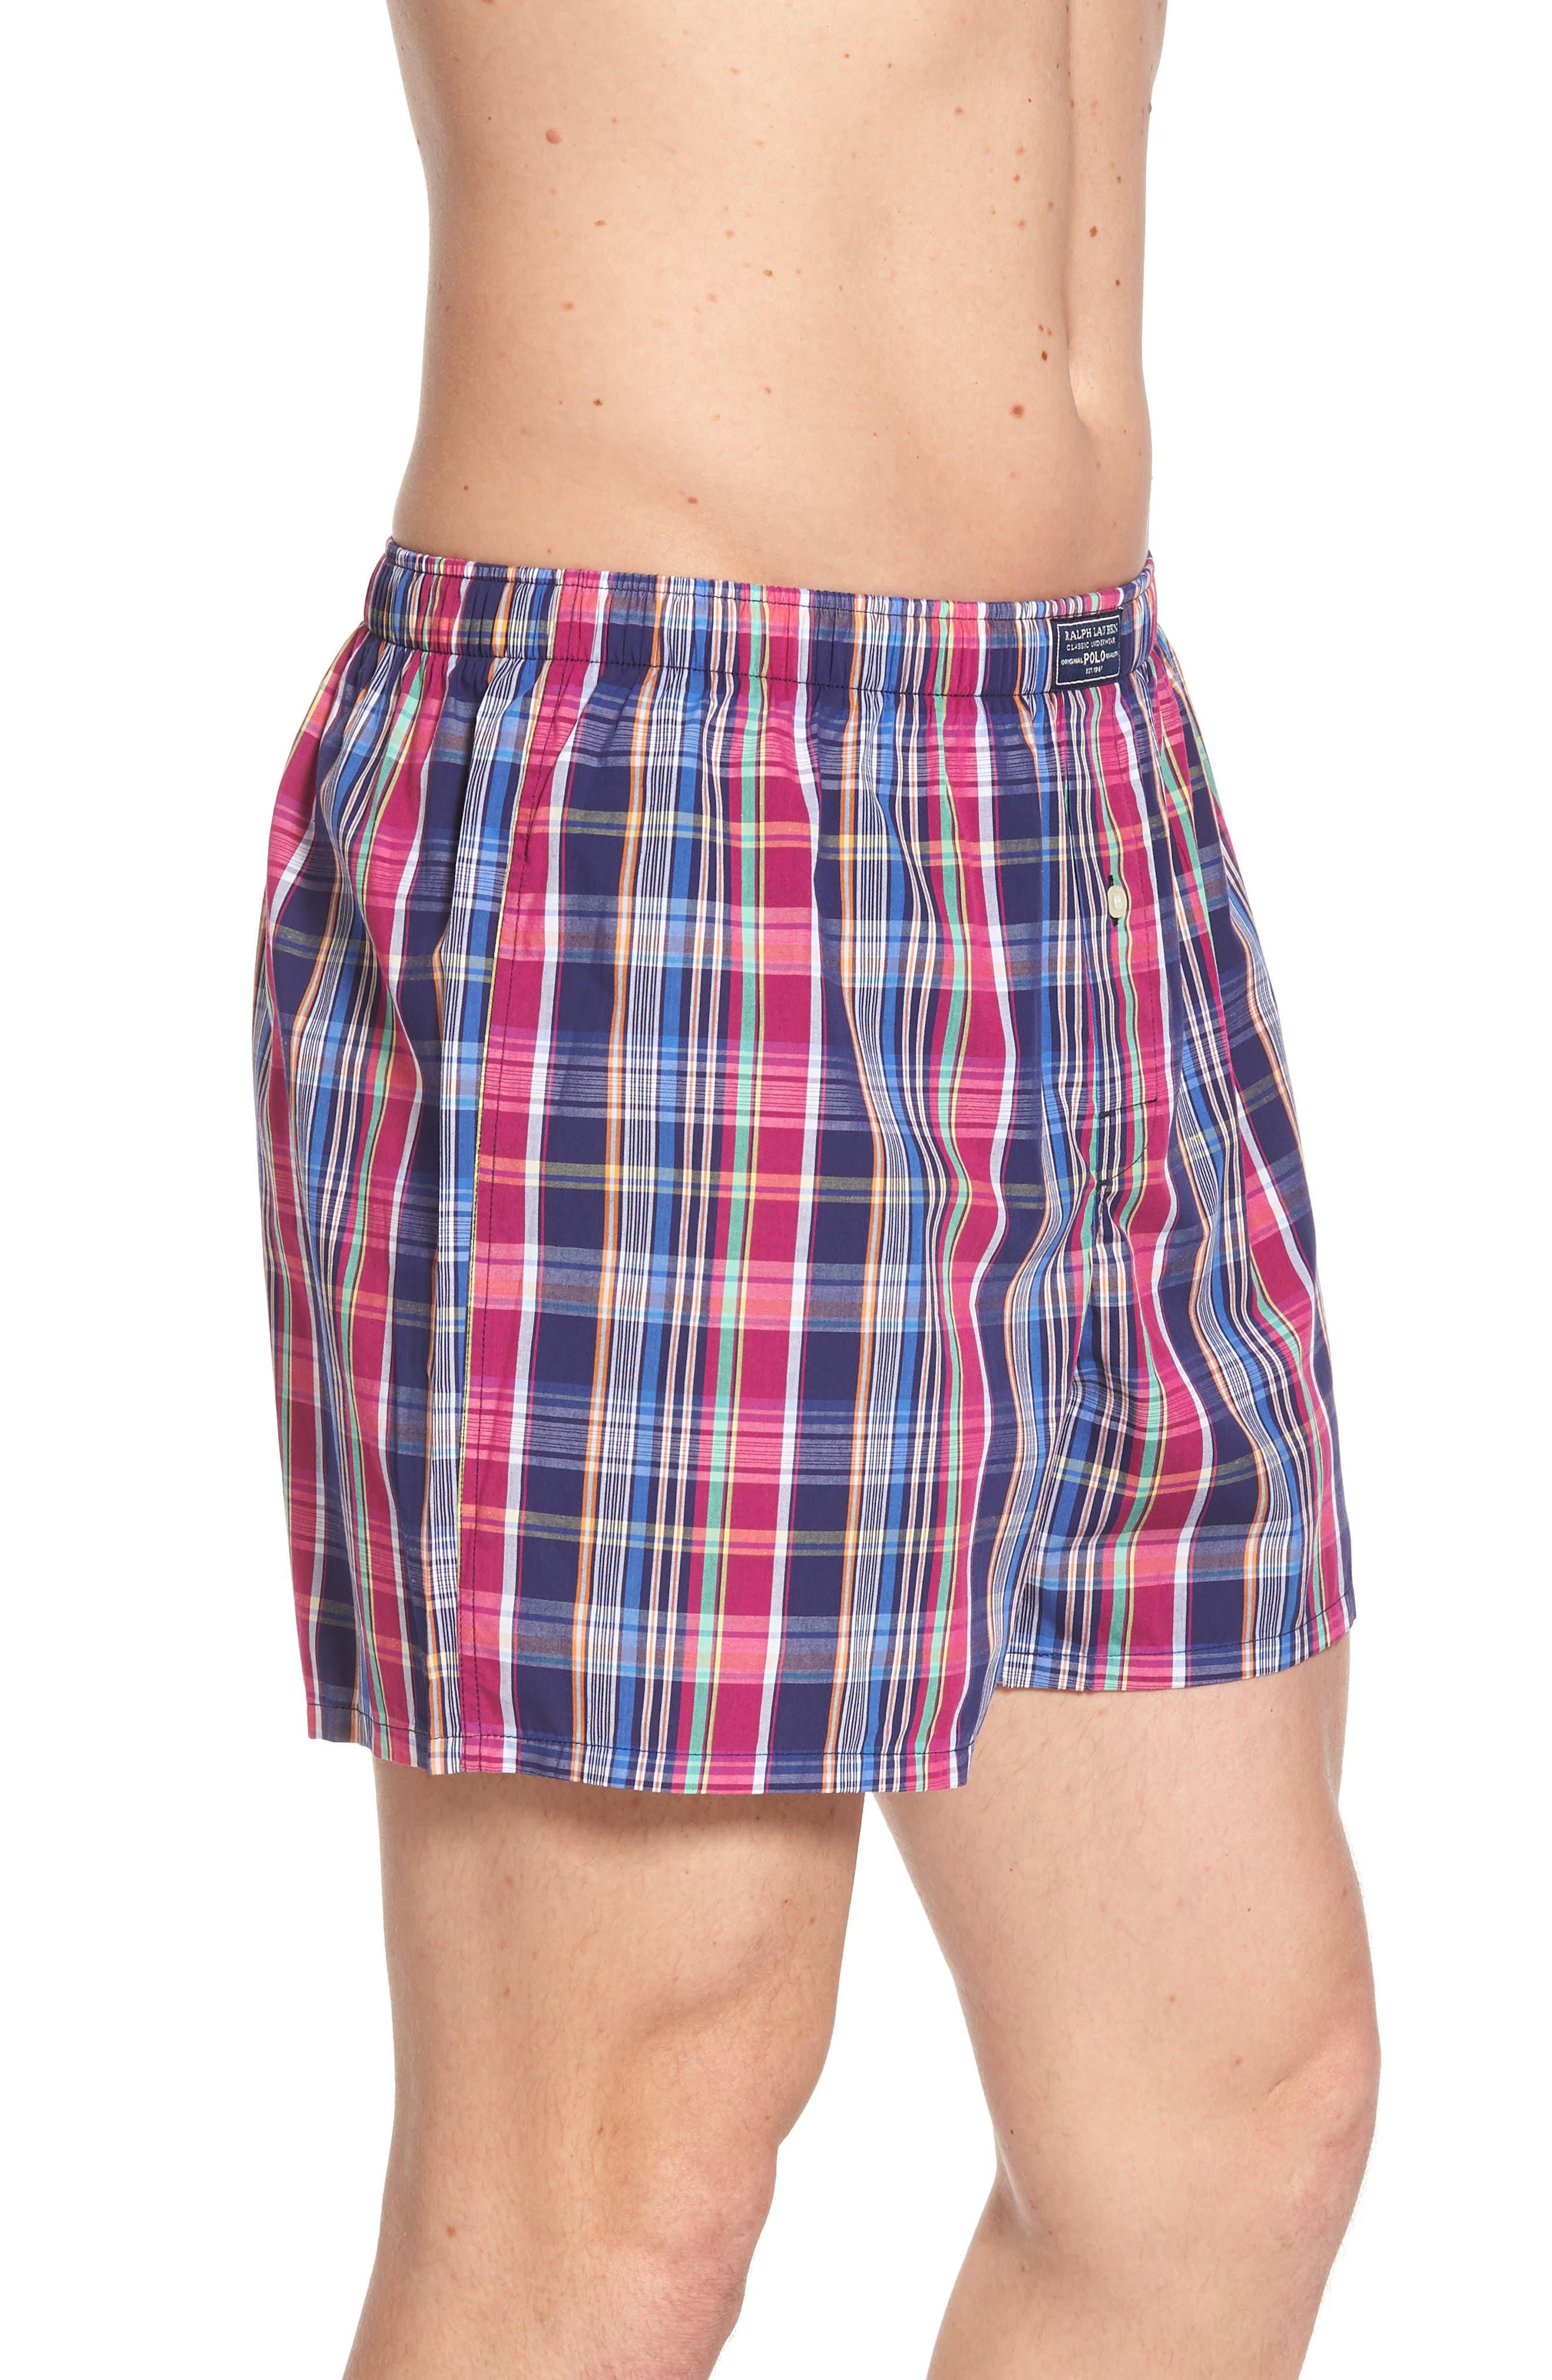 Woven Cotton Boxers,                             Alternate thumbnail 3, color,                             Collin Plaid/ Bright Pink